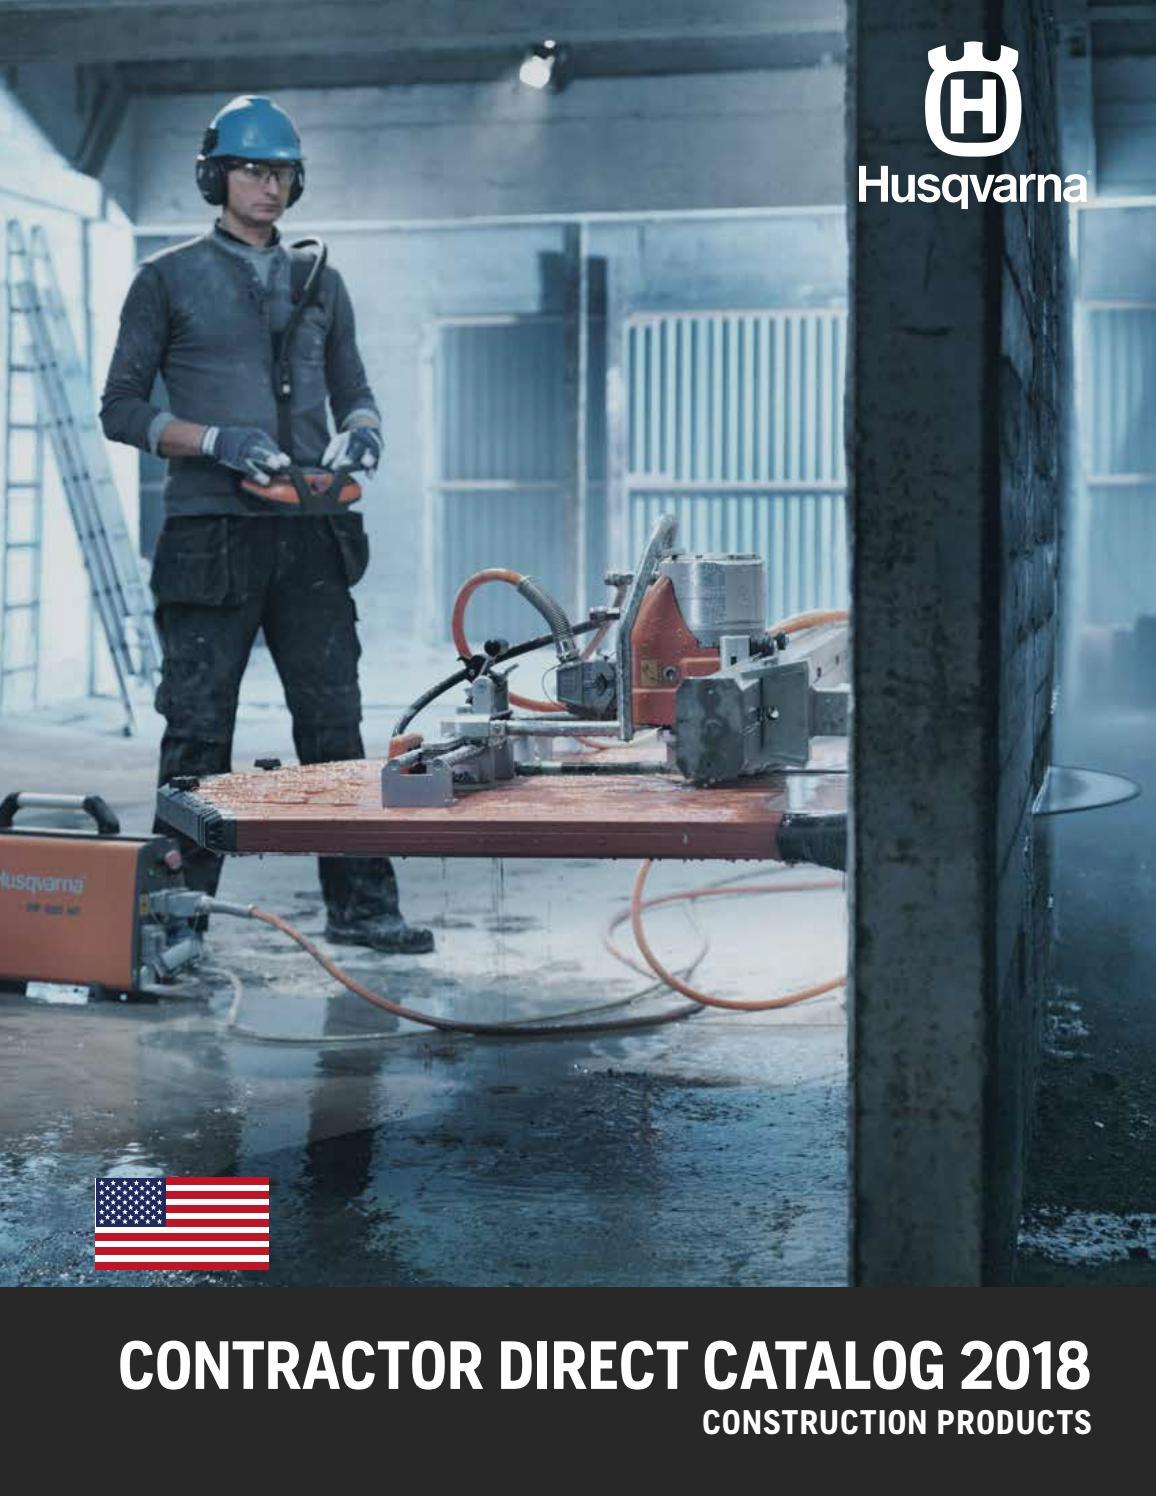 Oil Pump Gear for Husqvarna 350 Chainsaw L/&S Engineers